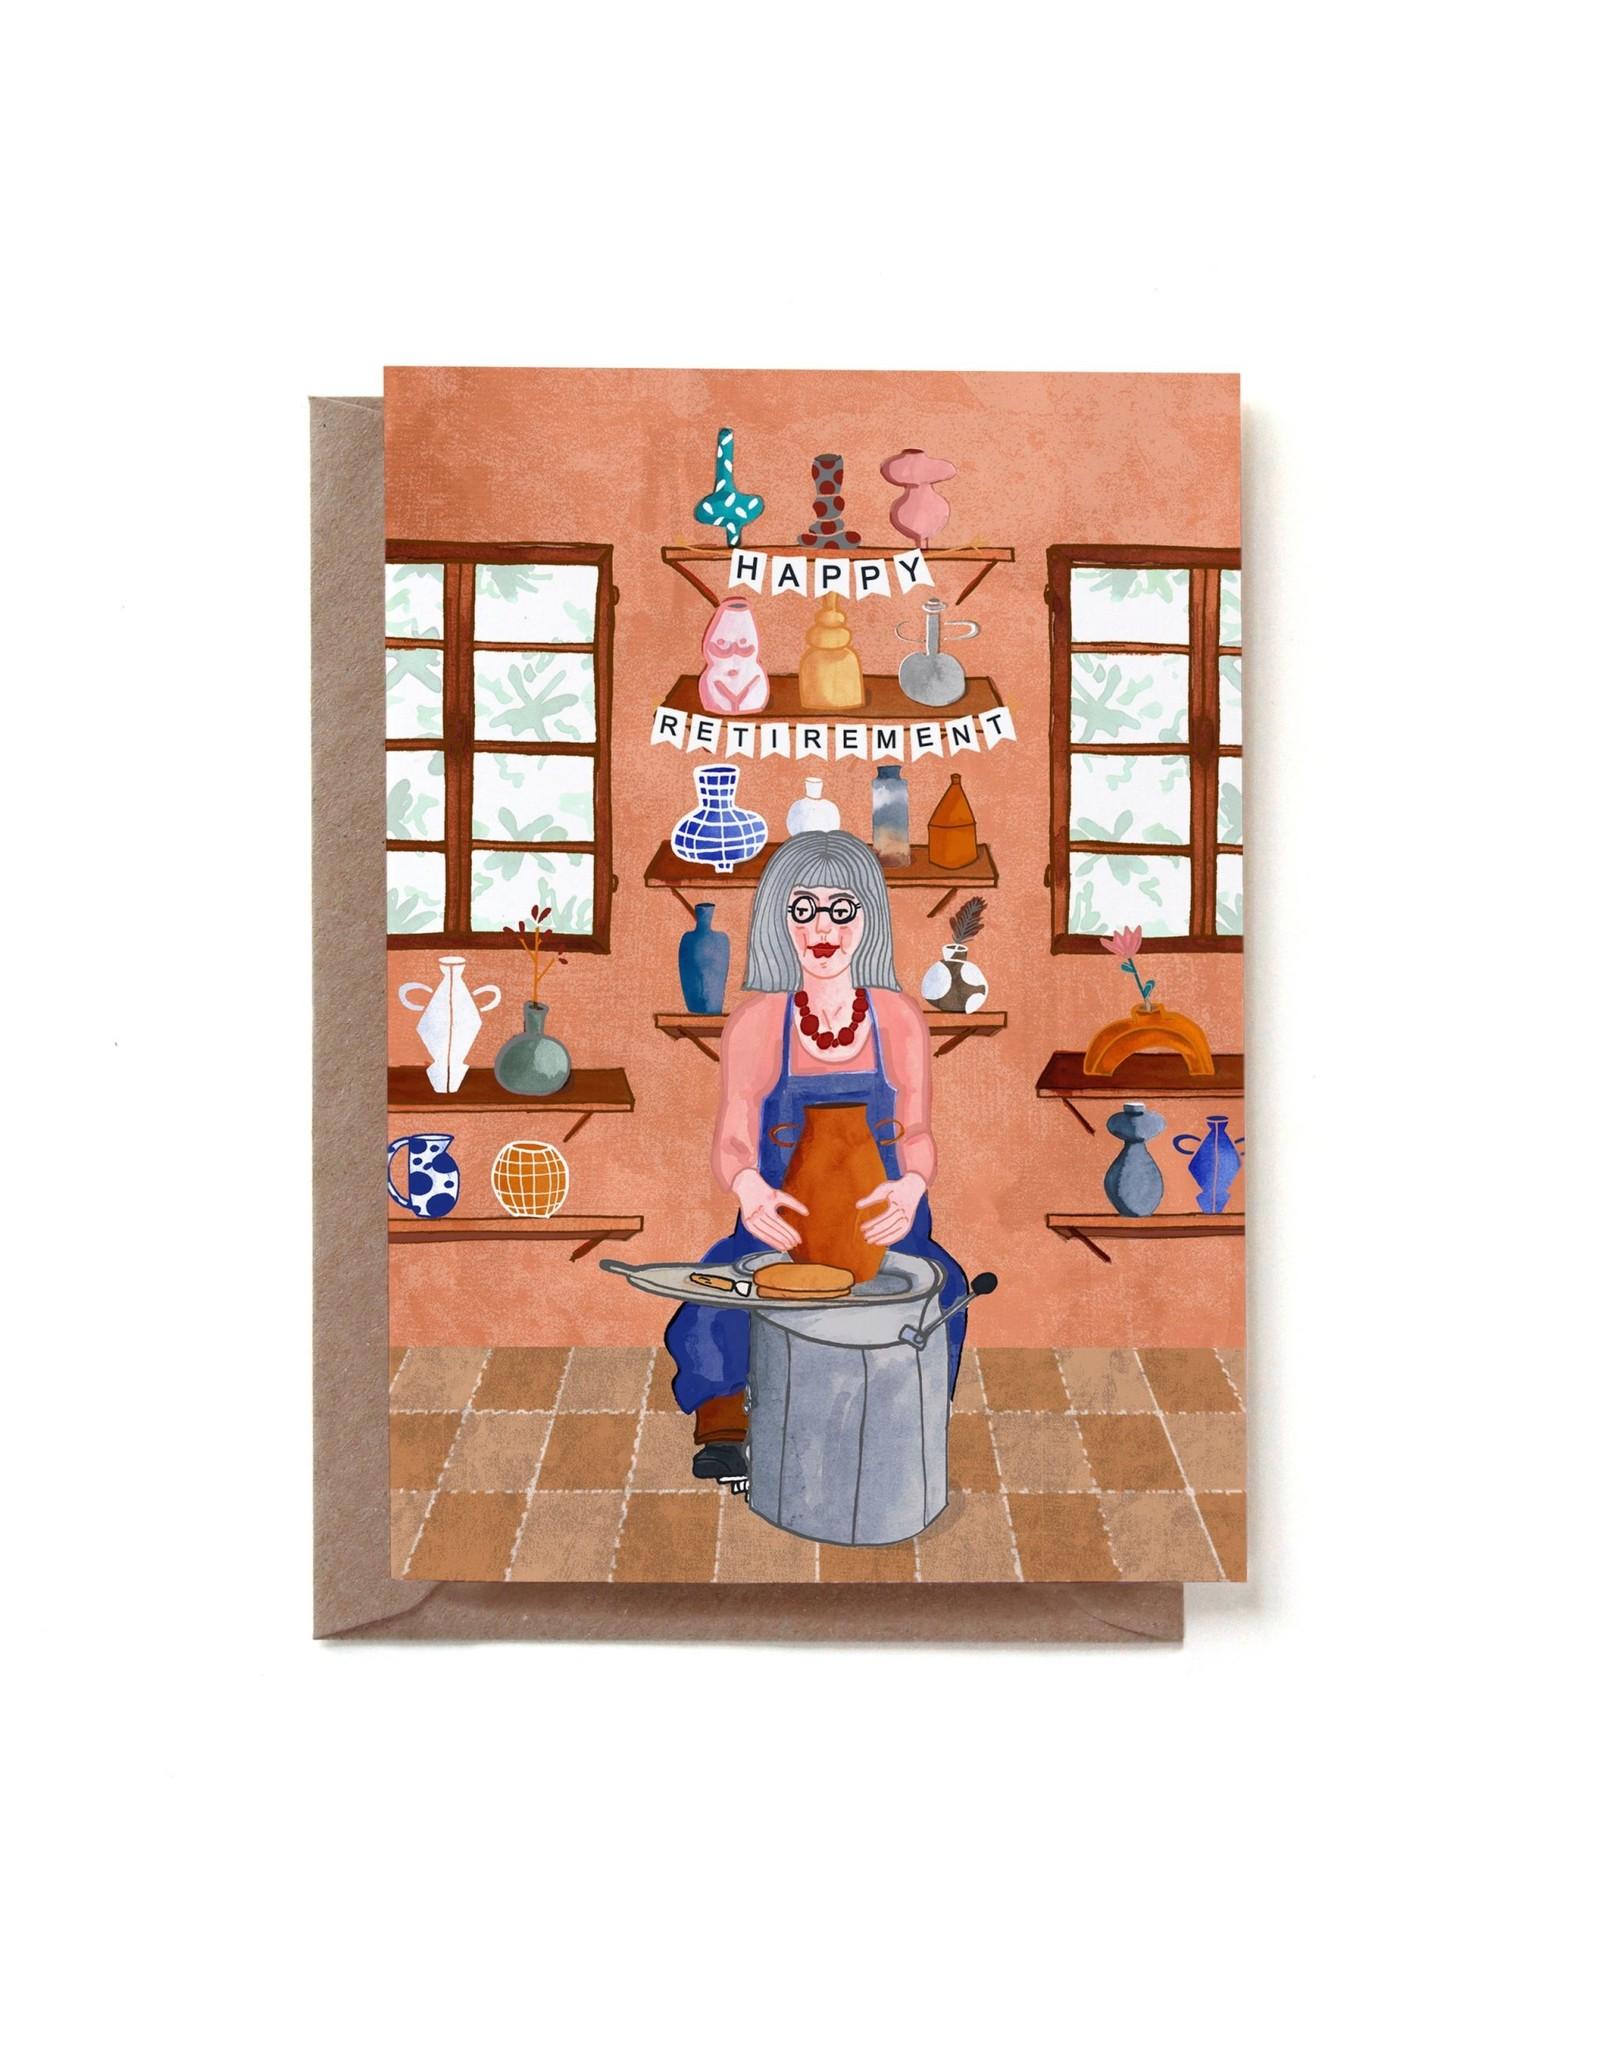 Reddish Design Wenskaart - Happy Retirement woman - Dubbele kaart + Envelope - 10 x 15cm